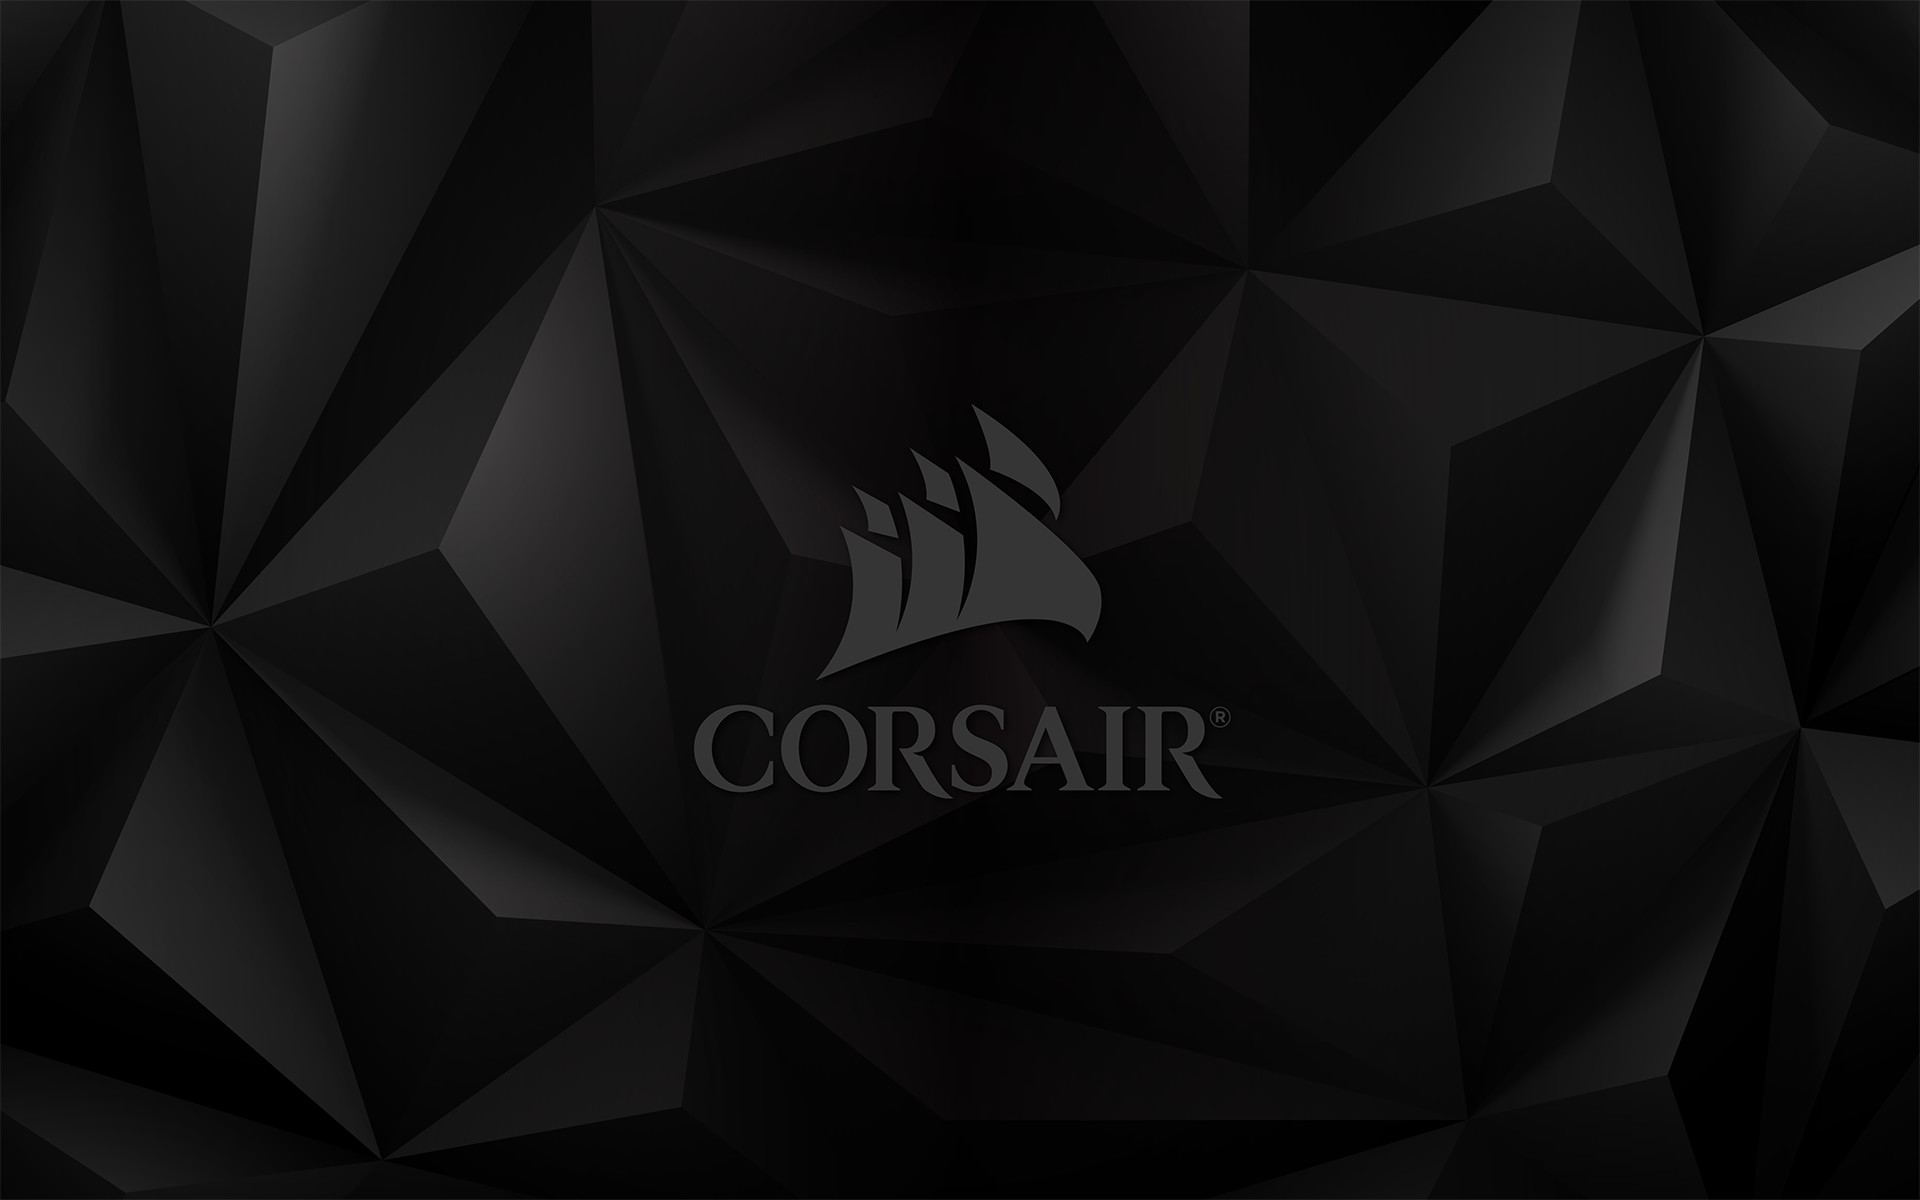 Corsair desktop wallpaper 80 images for Sfondi 1920x1080